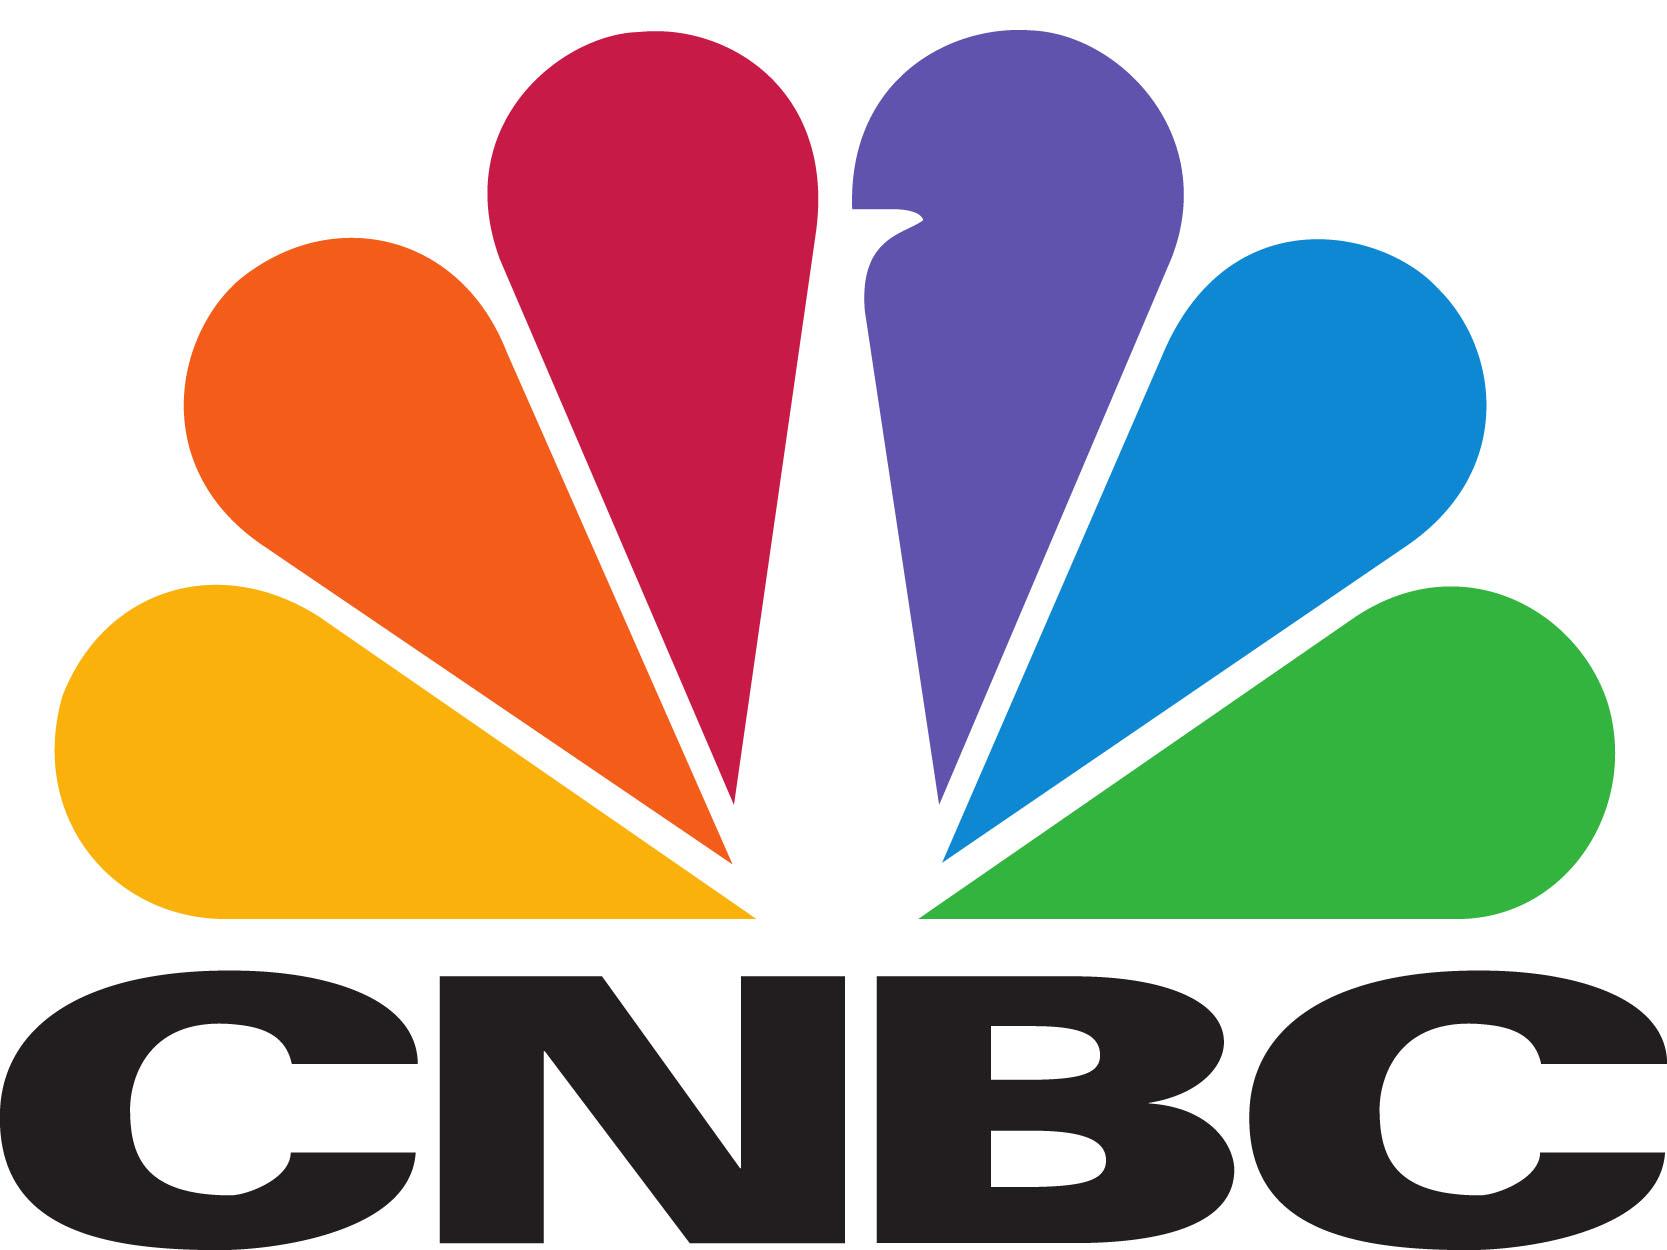 Cnbc_logo-2